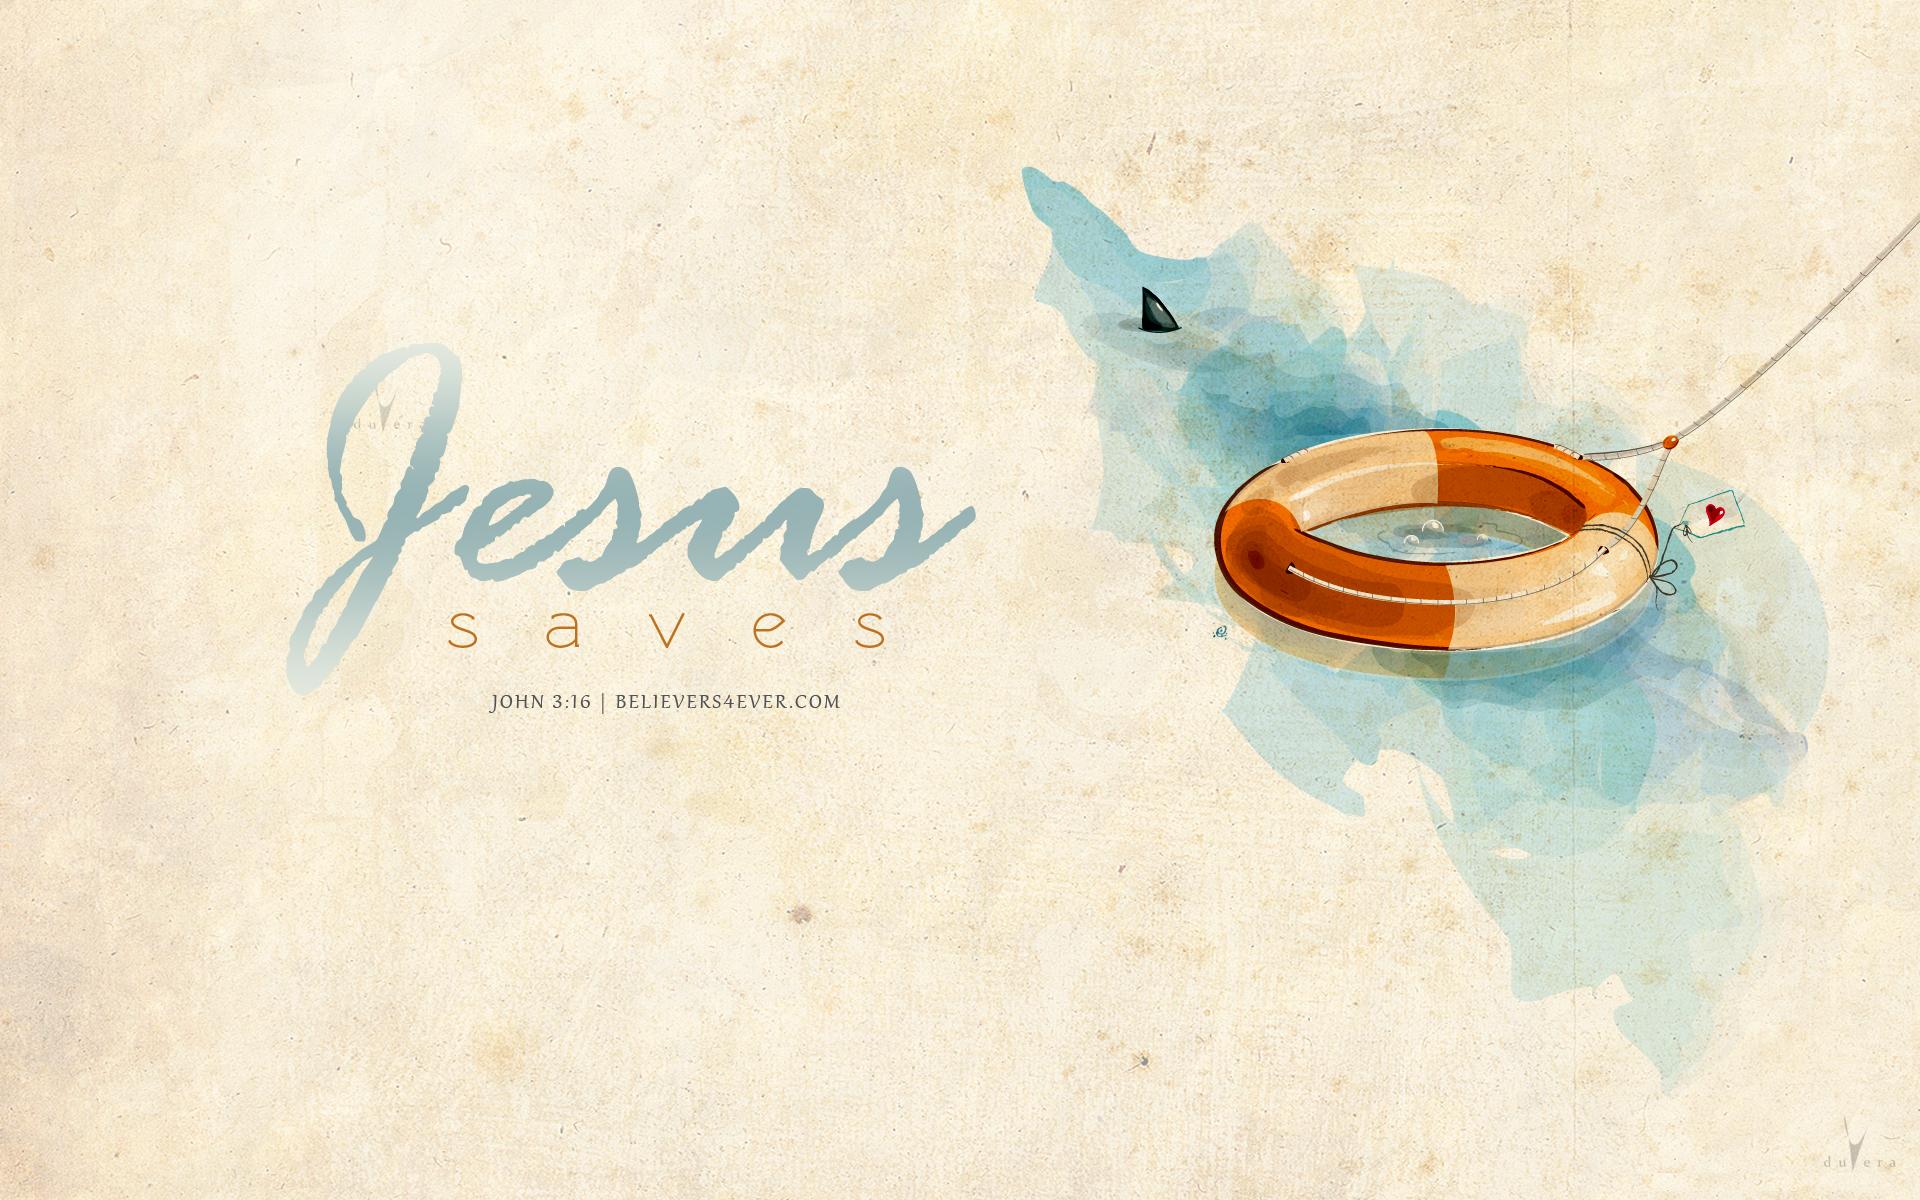 Jesus saves   Believers4evercom 1920x1200